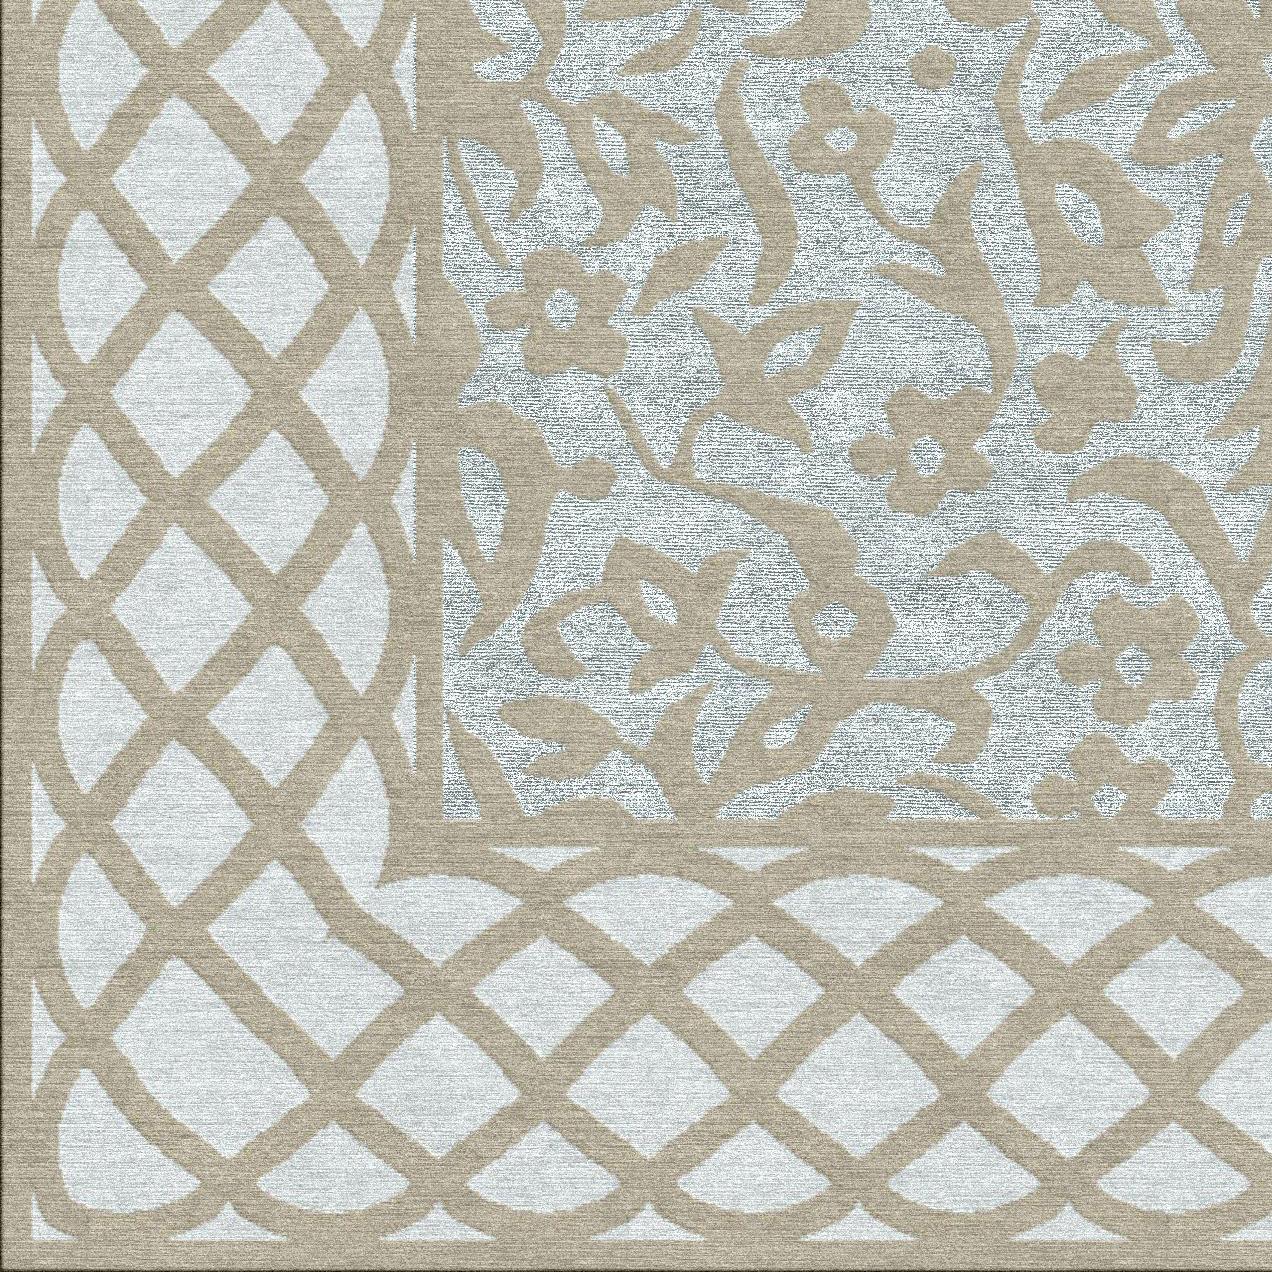 Arab And Islamic Wcd01390 3 Wool Classics